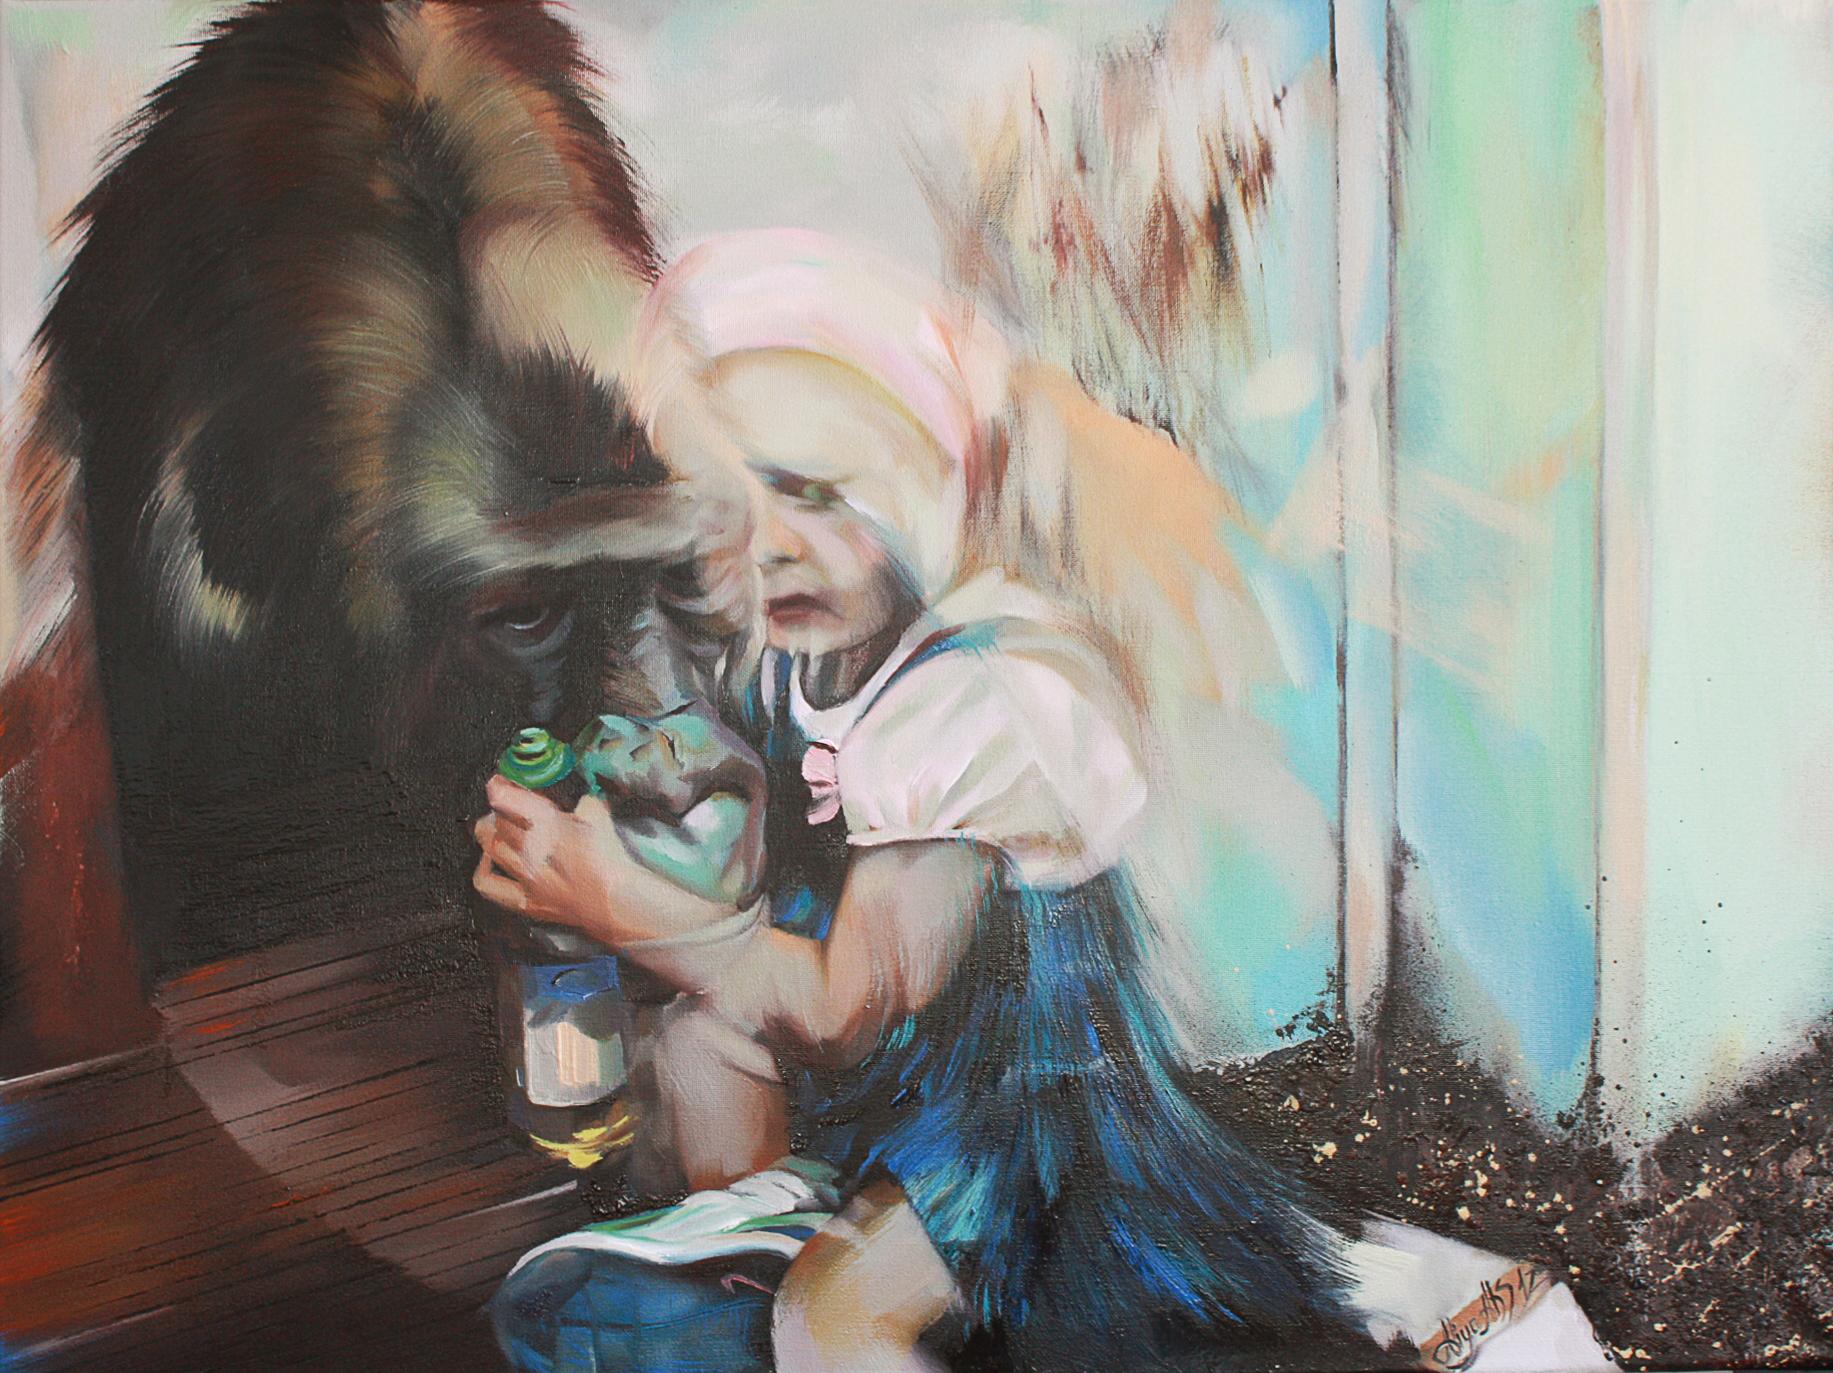 Aliya Abs - Keine Angst - obacht! Kunst